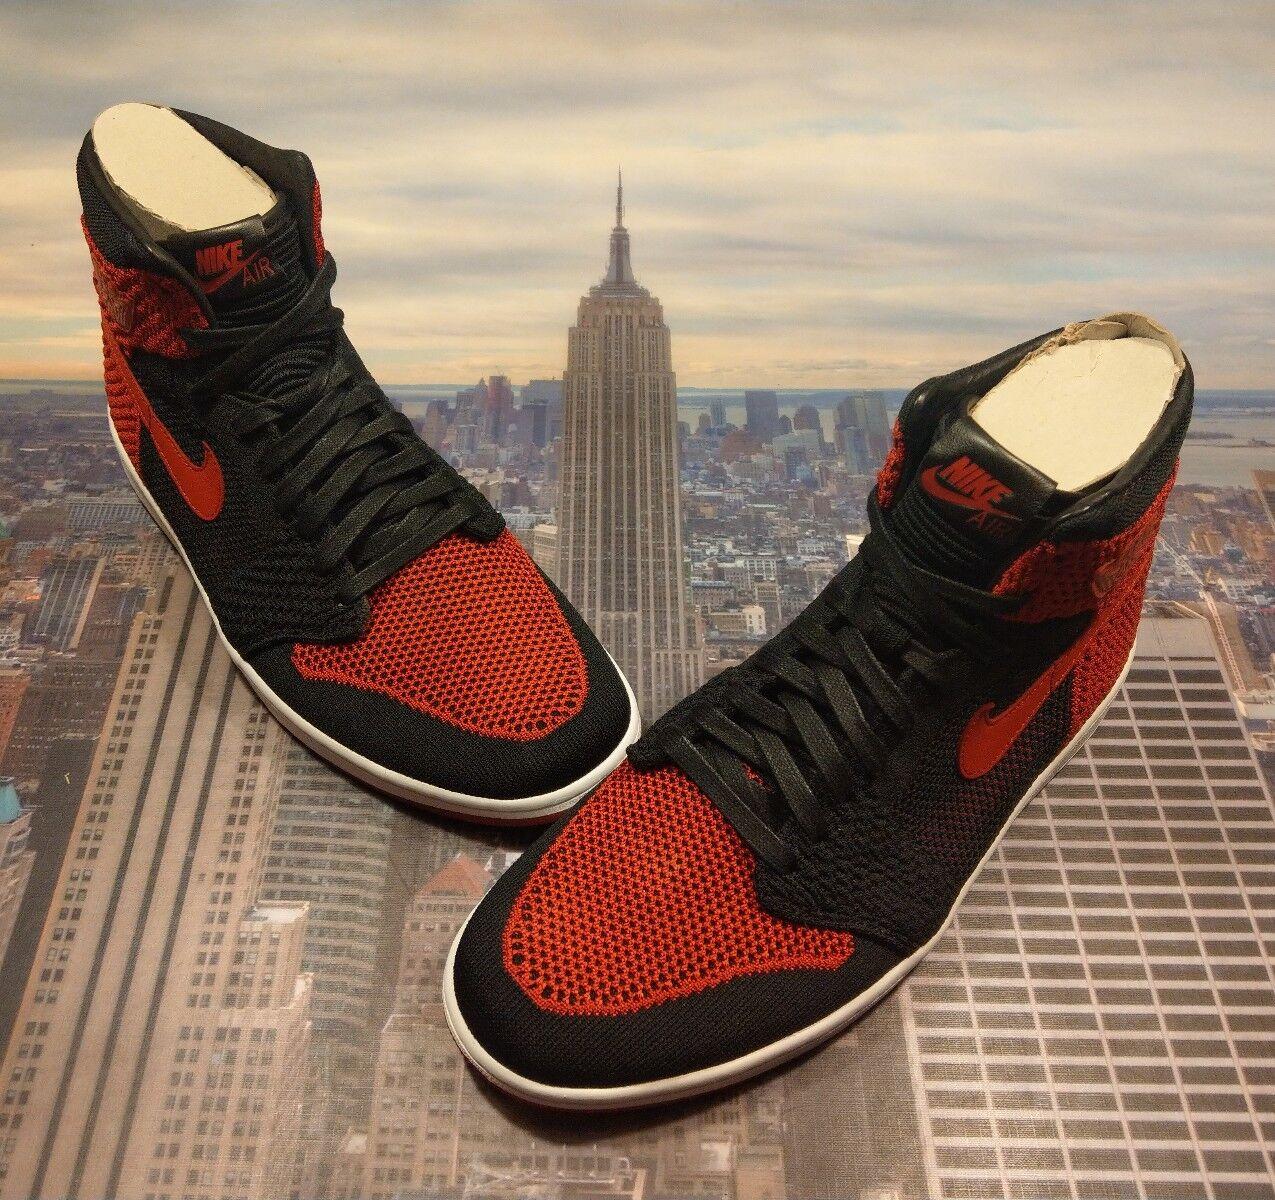 Nike Air Jordan 1 Retro High Flyknit Bred Black/Varsity Red Size 11 919704 001